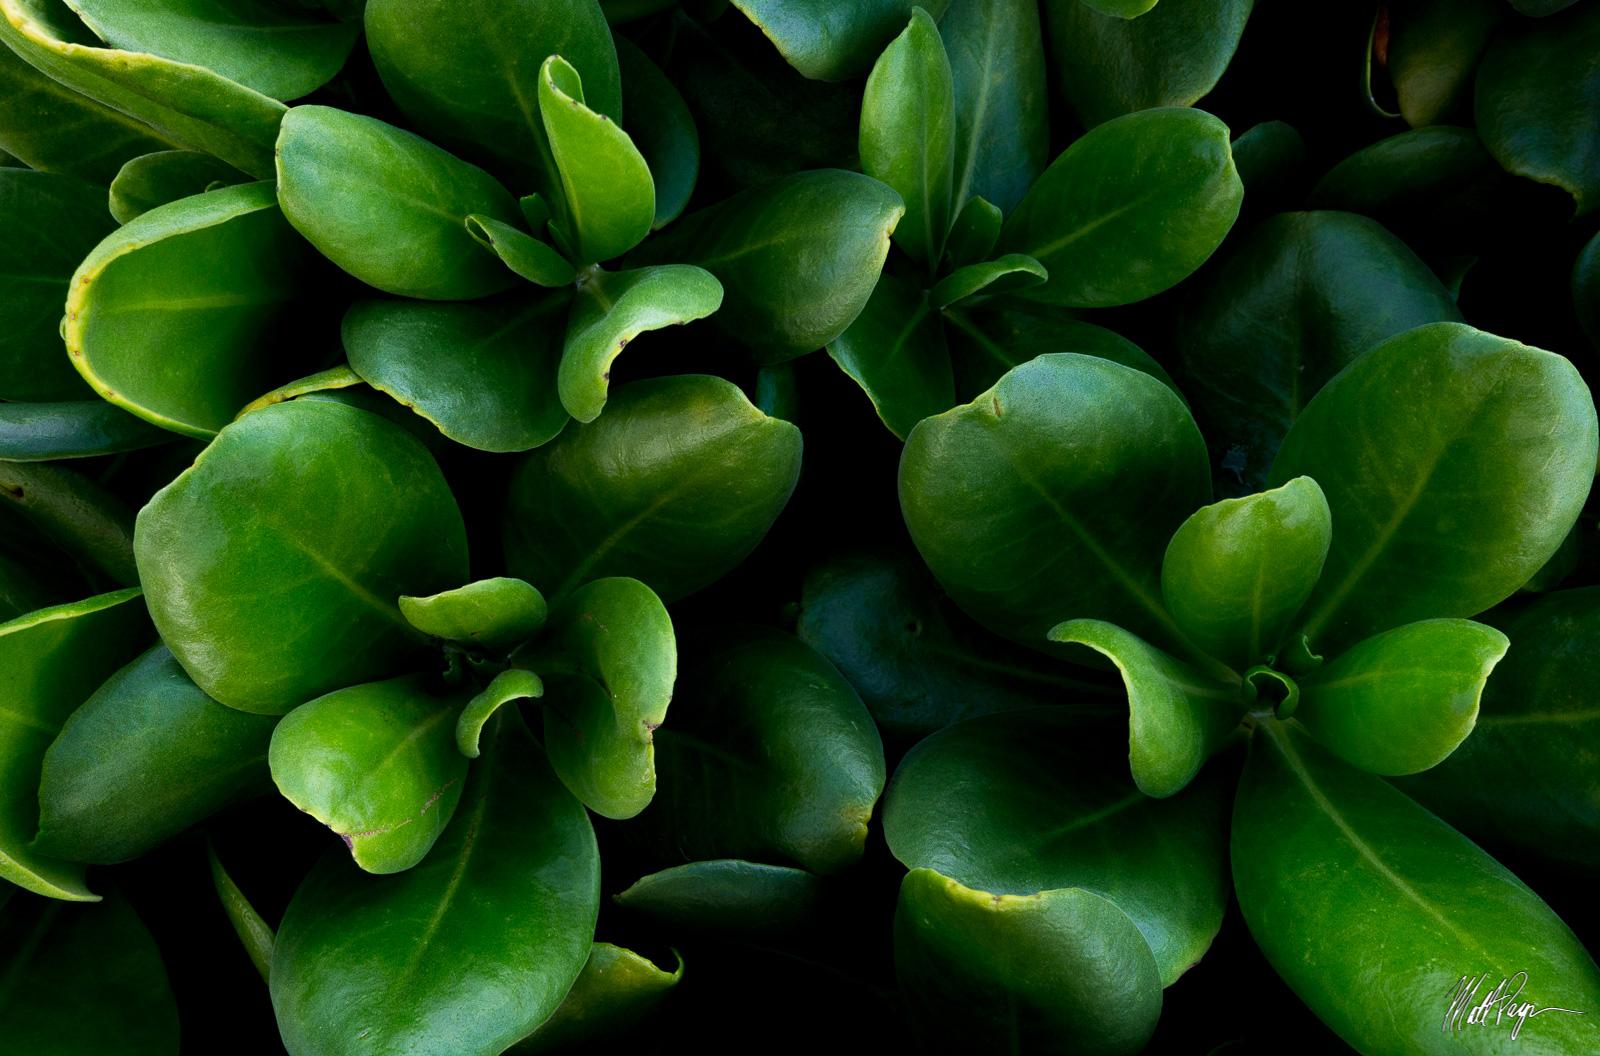 Kauai, Hawaii, Naupaka, foliage, intimate landscape, legend, Poipu, plant, photo